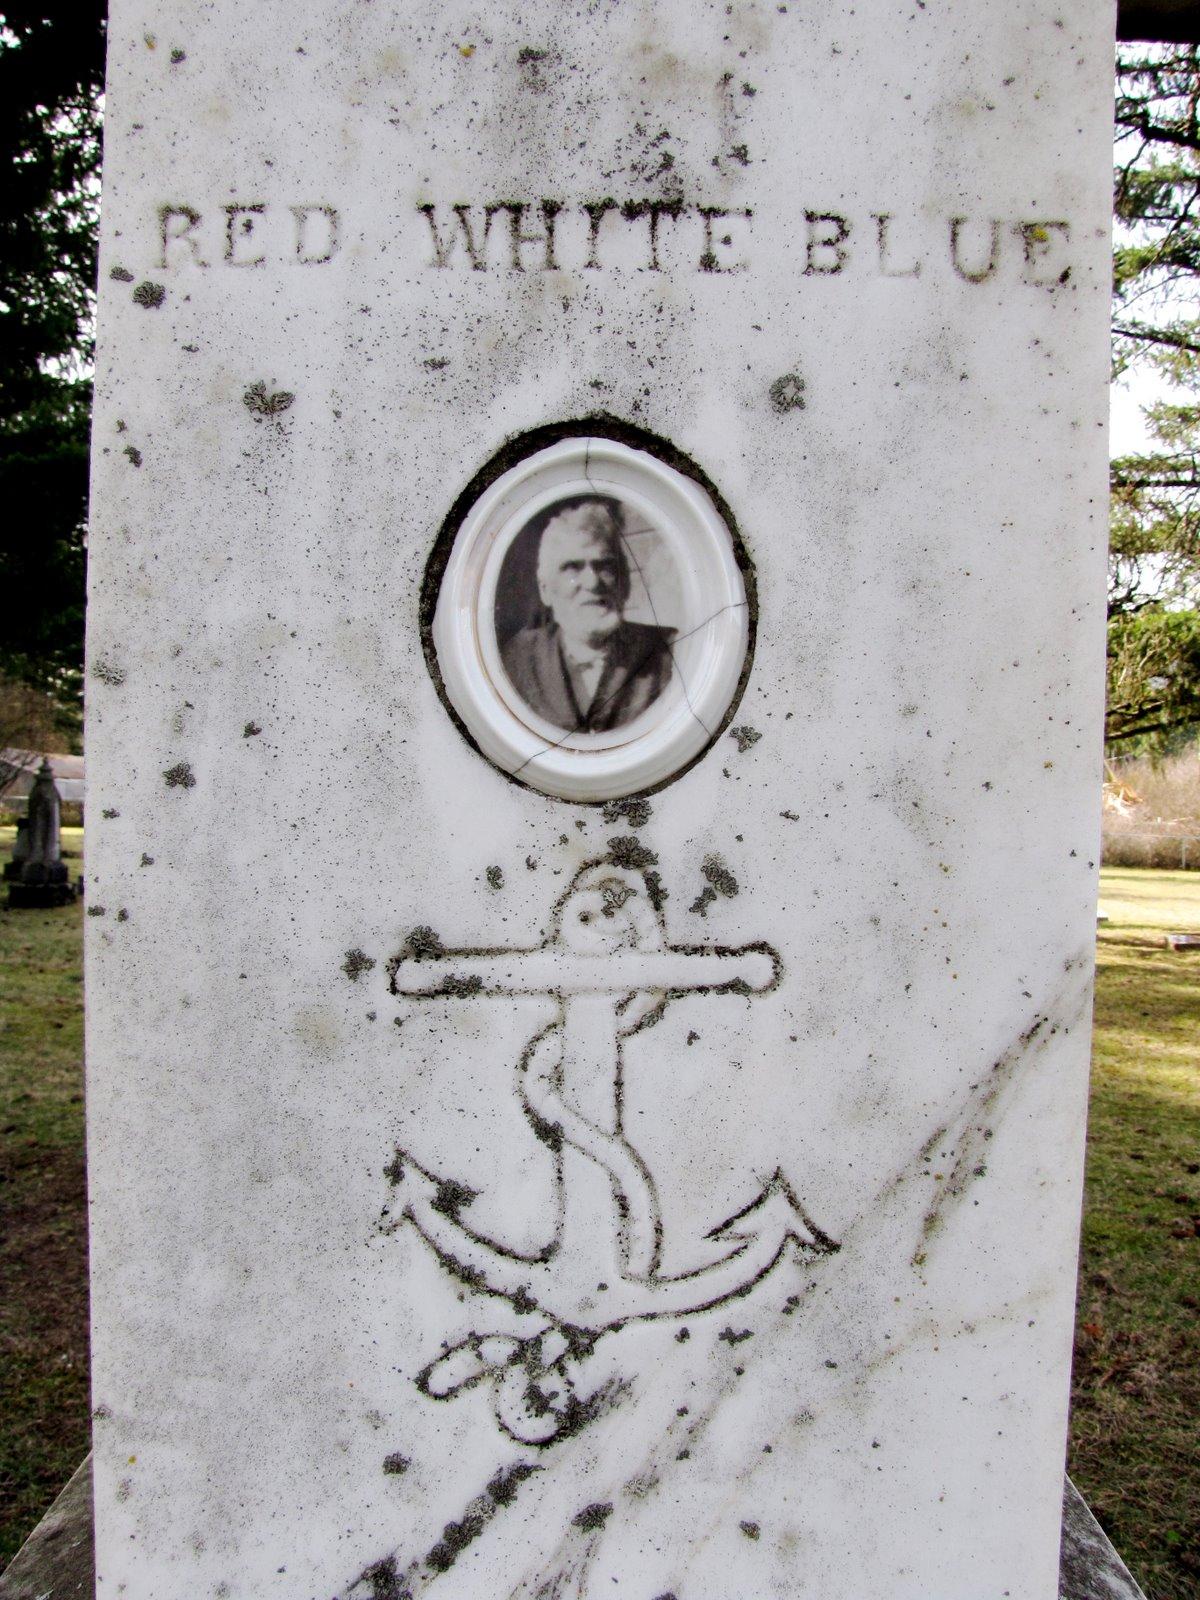 [red:white:blue+(cascade)]